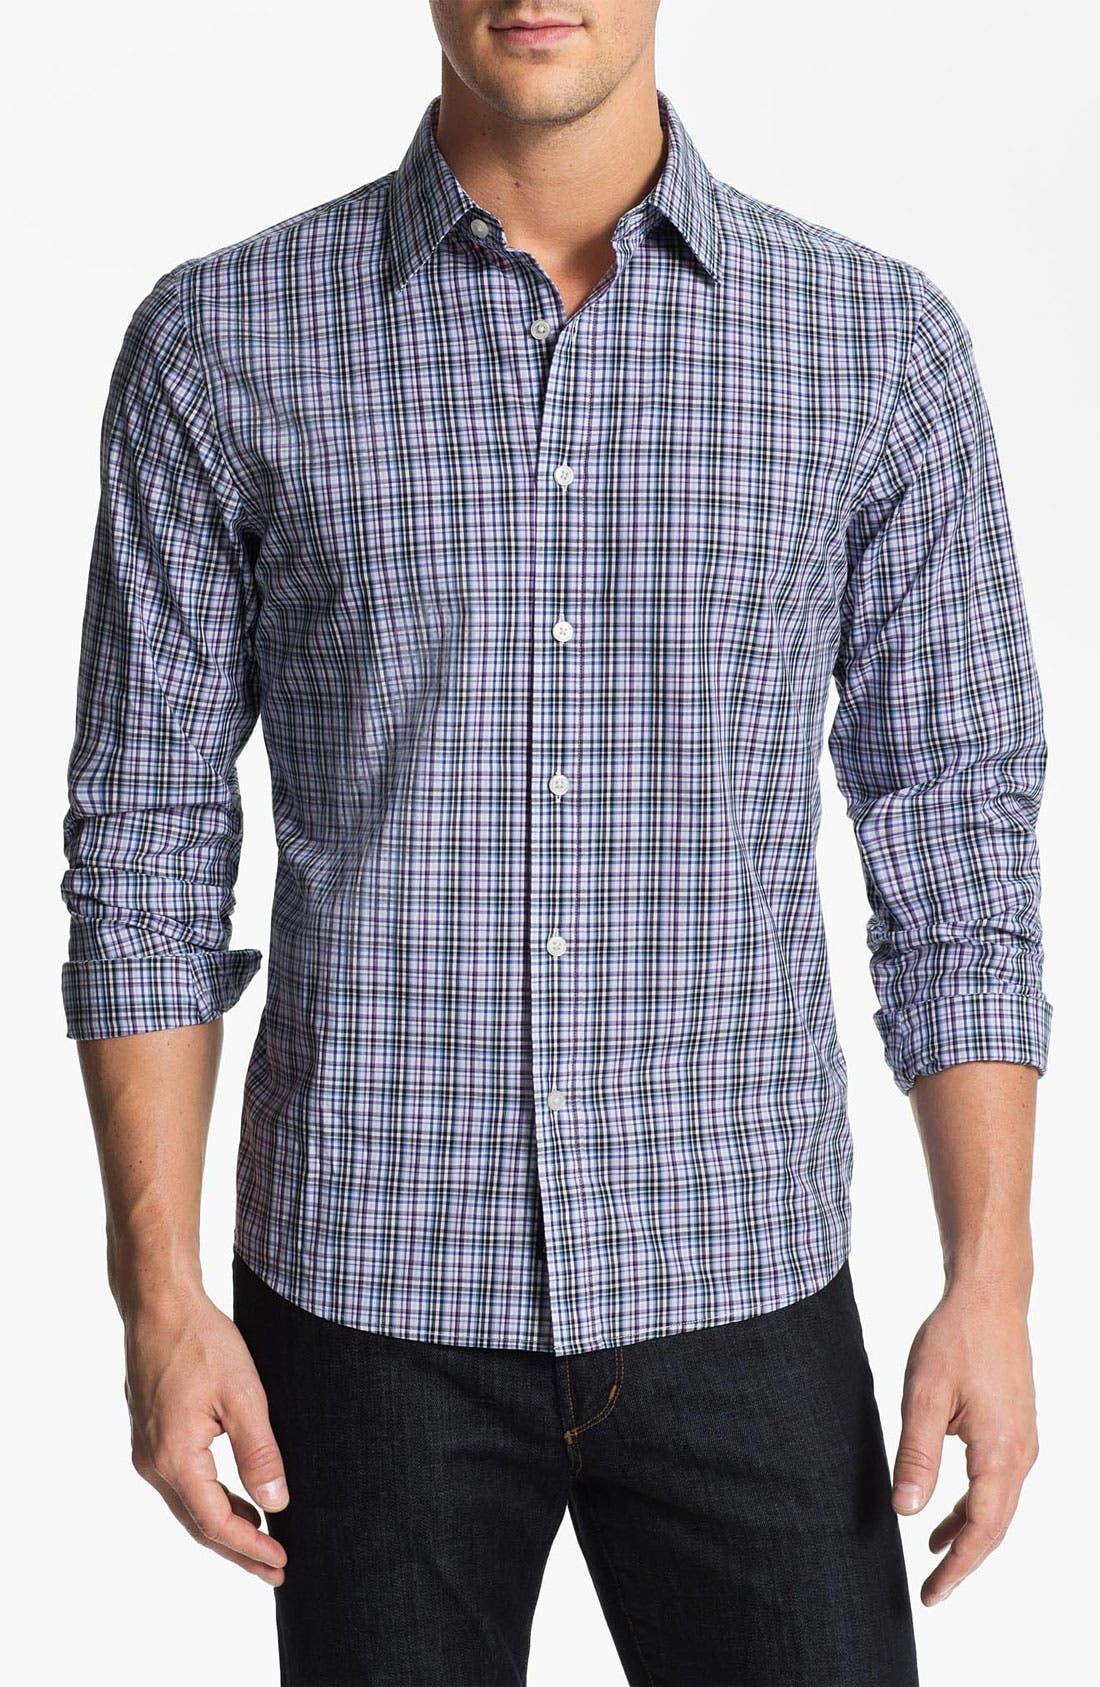 Main Image - Michael Kors 'Morgan Check' Sport Shirt